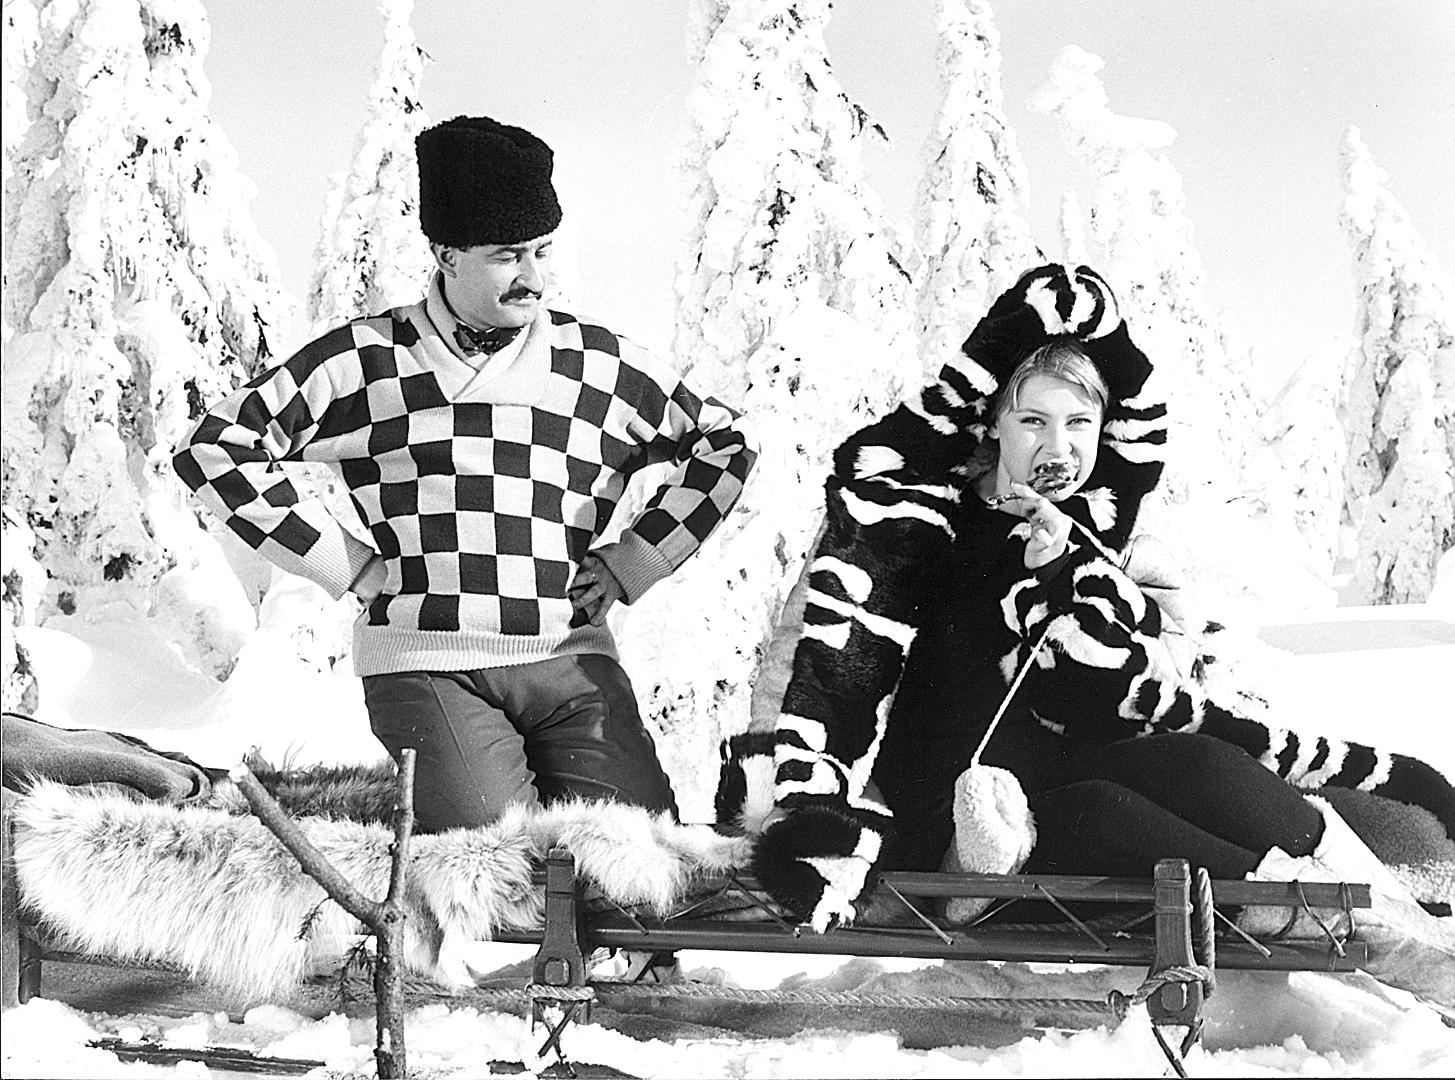 Juraj Herz and Gitte Hænning in Dýmky (1966)